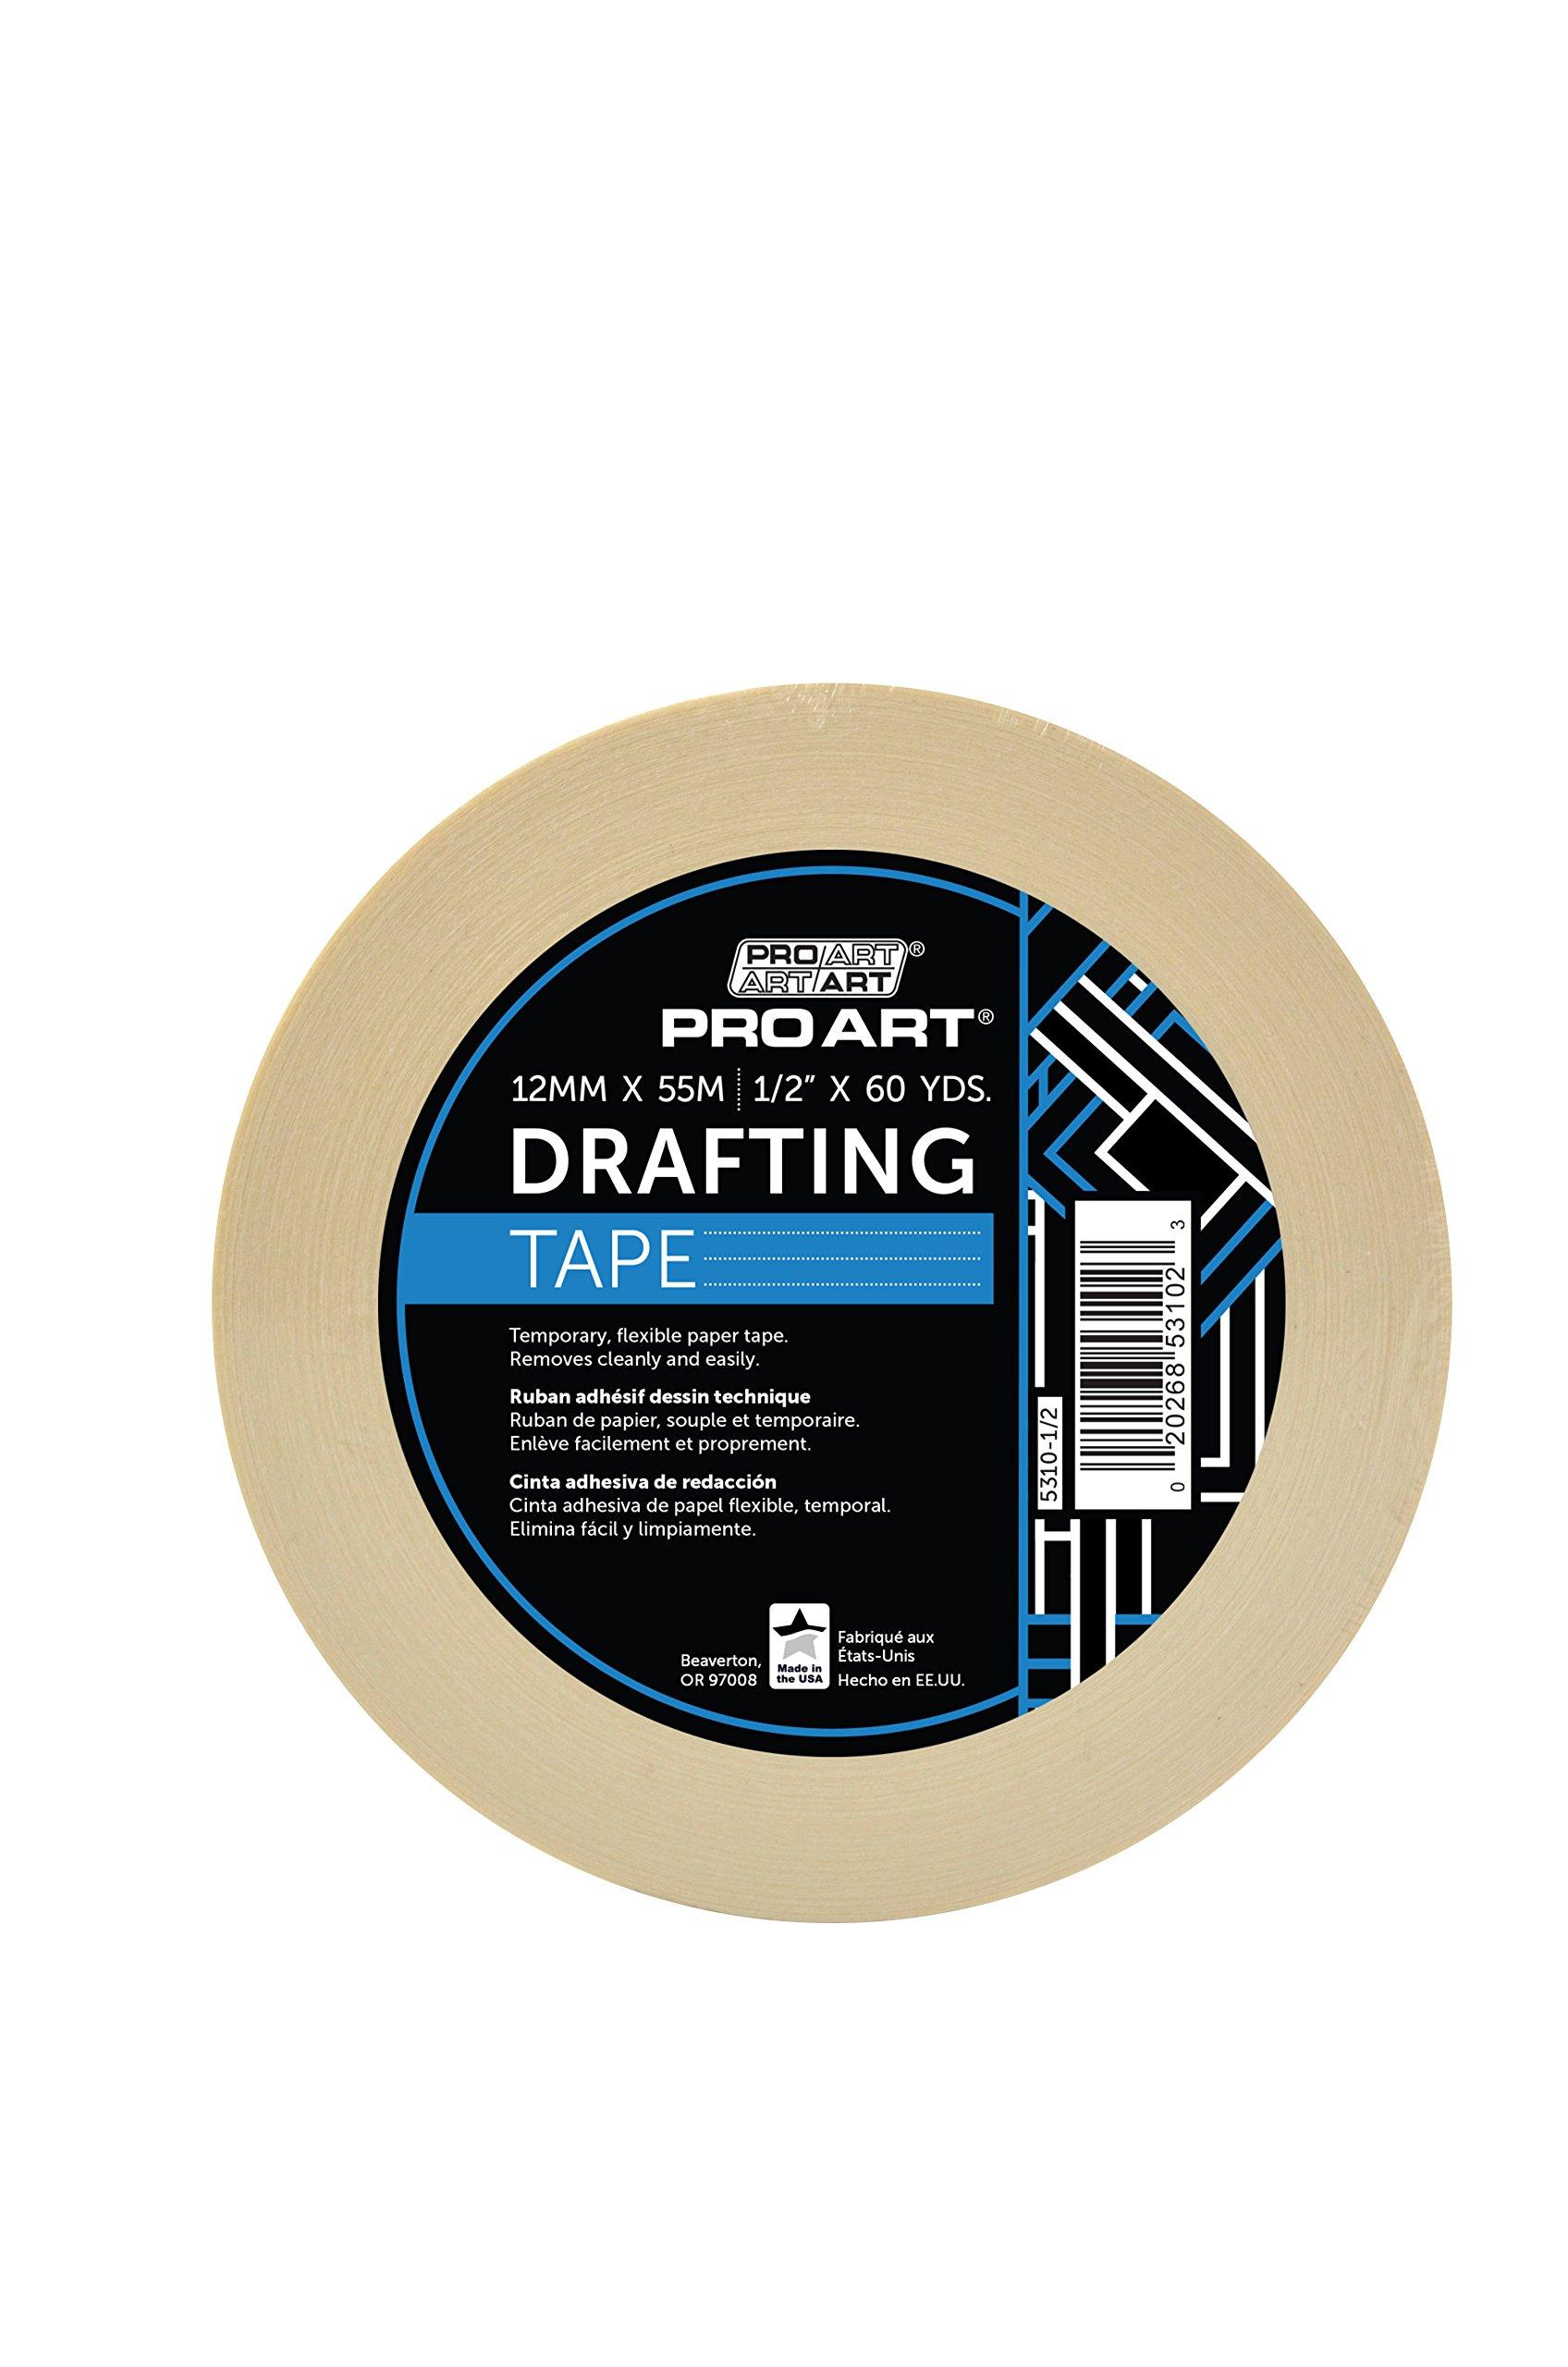 Pro Art PRO-5310-1/2 Drafting Tape, 1/2'' x 60 yd